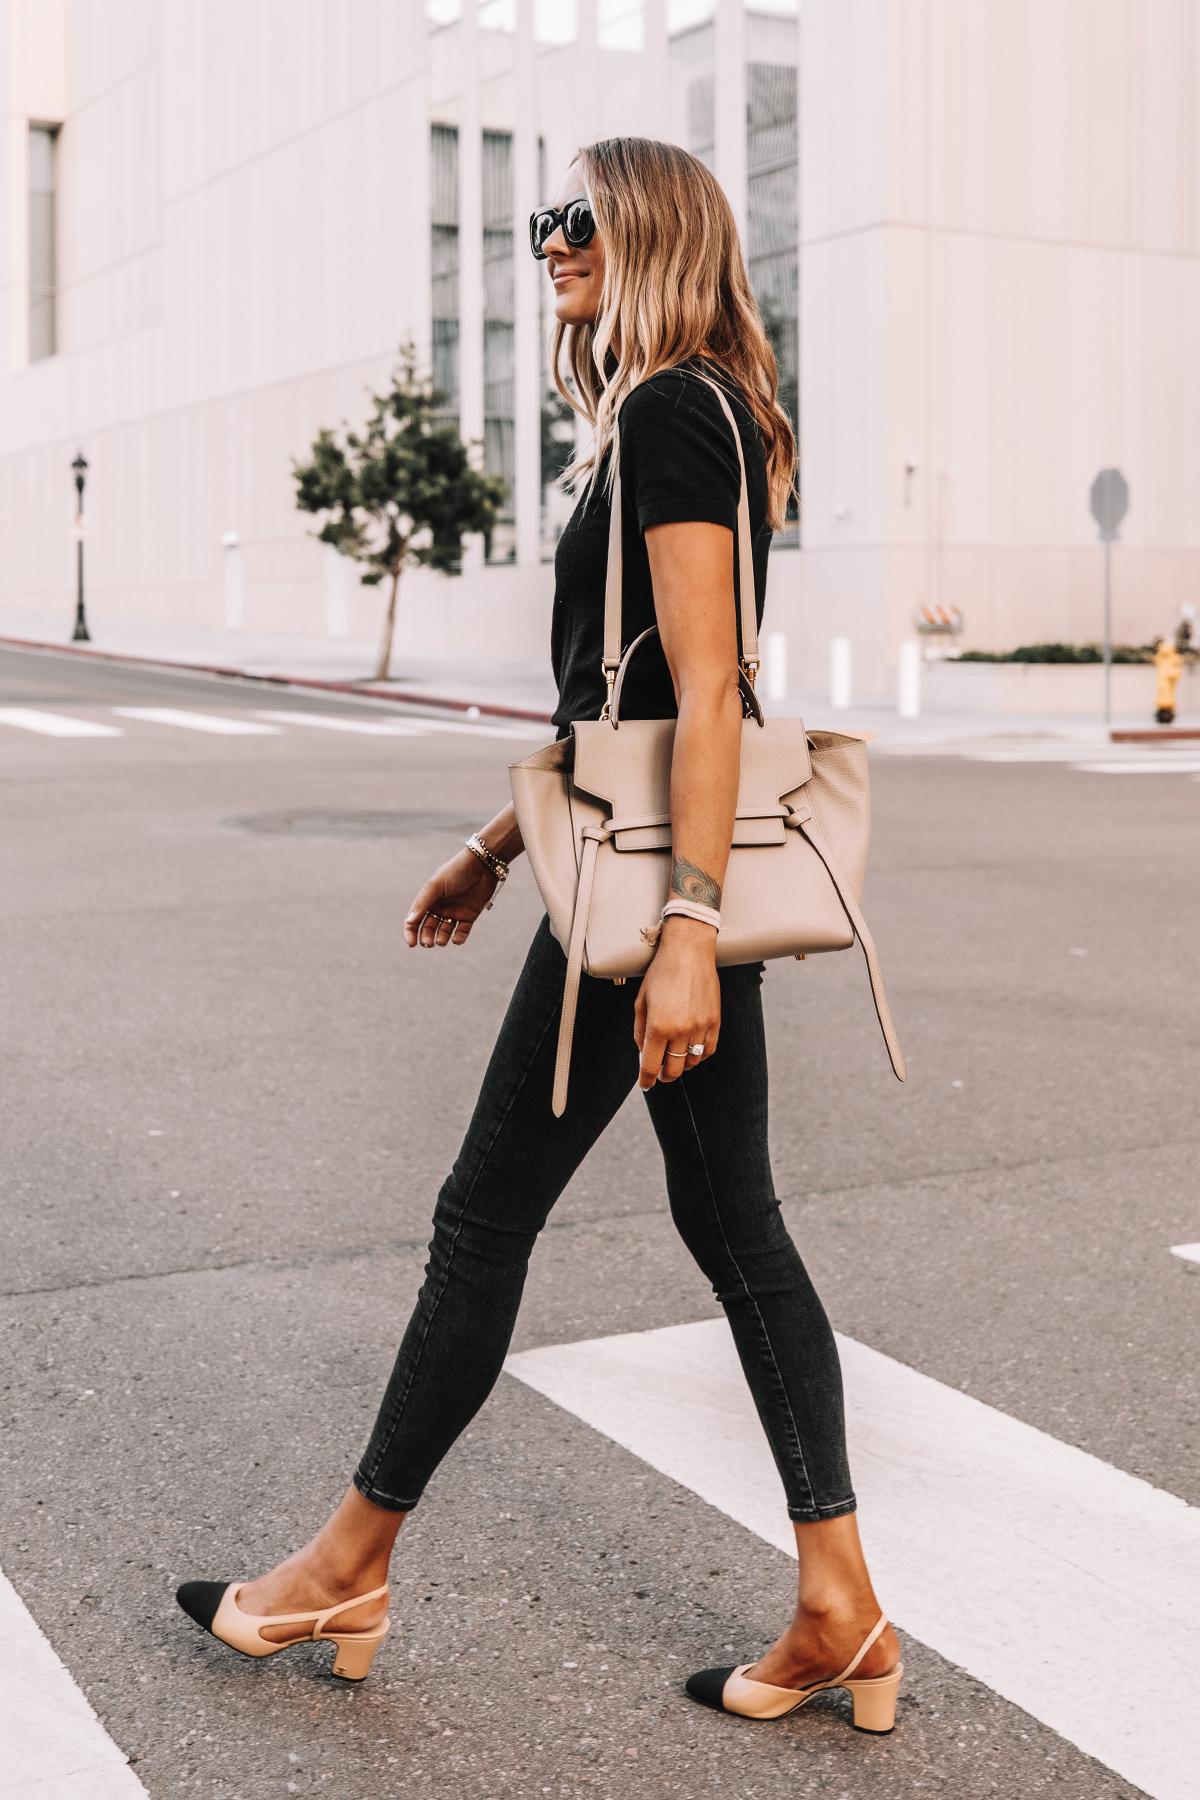 Fashion Jackson Wearing Everlane Black Short Sleeve Sweater Everlane Black Skinny Jeans Chanel Slingbacks Celine Belt Bag 2